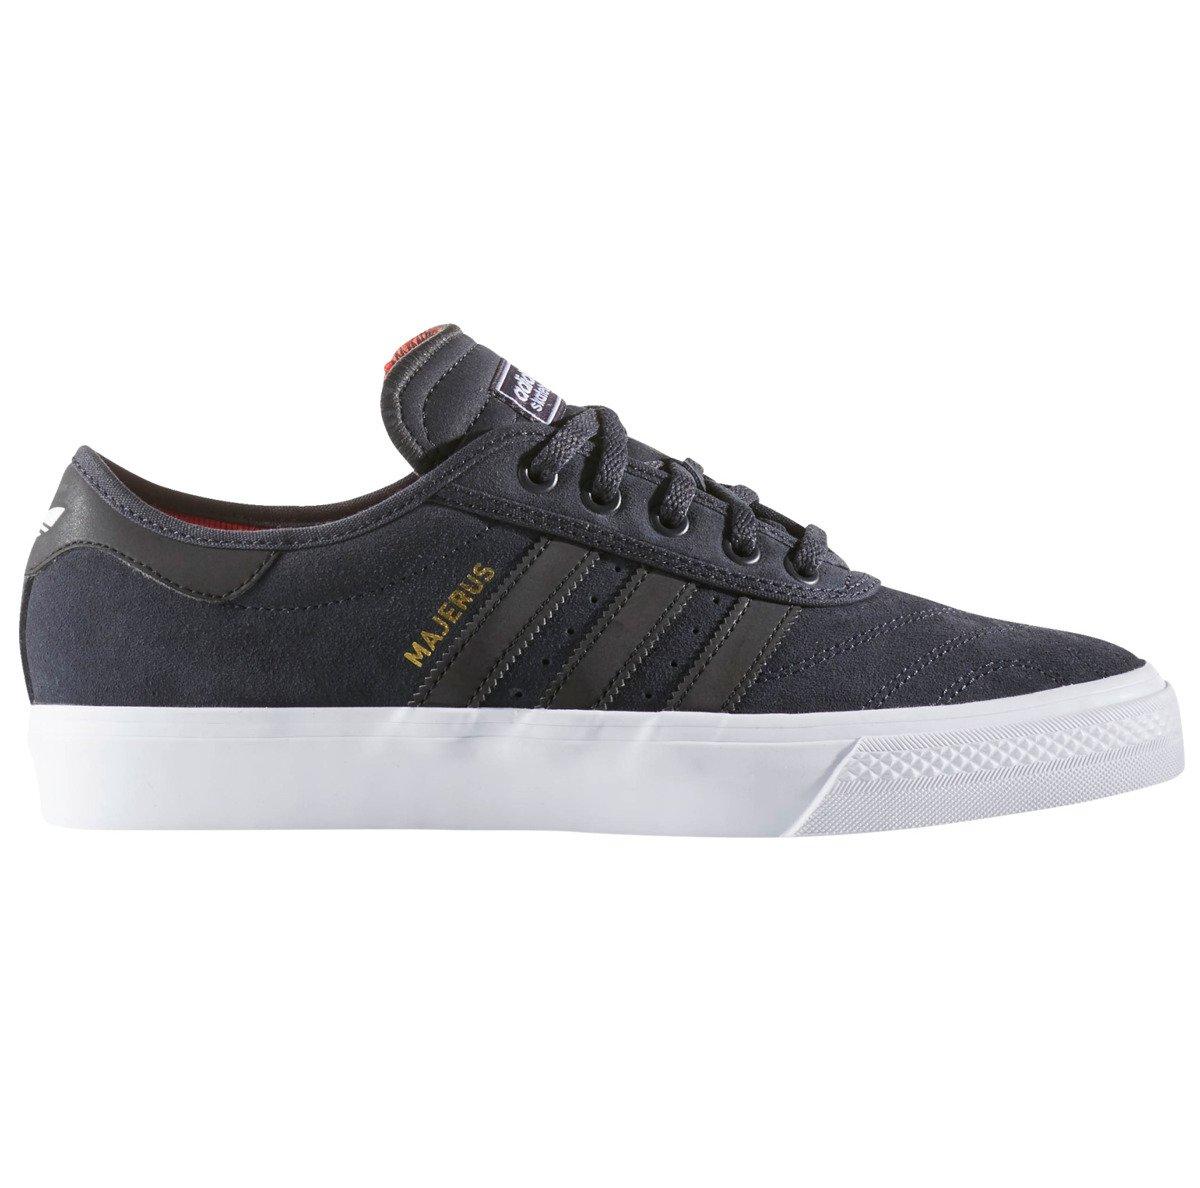 c8ef2102a3f Miniramp Skateshop buty adidas skateboarding adi-ease premiere adv custom  cblack ftwwht